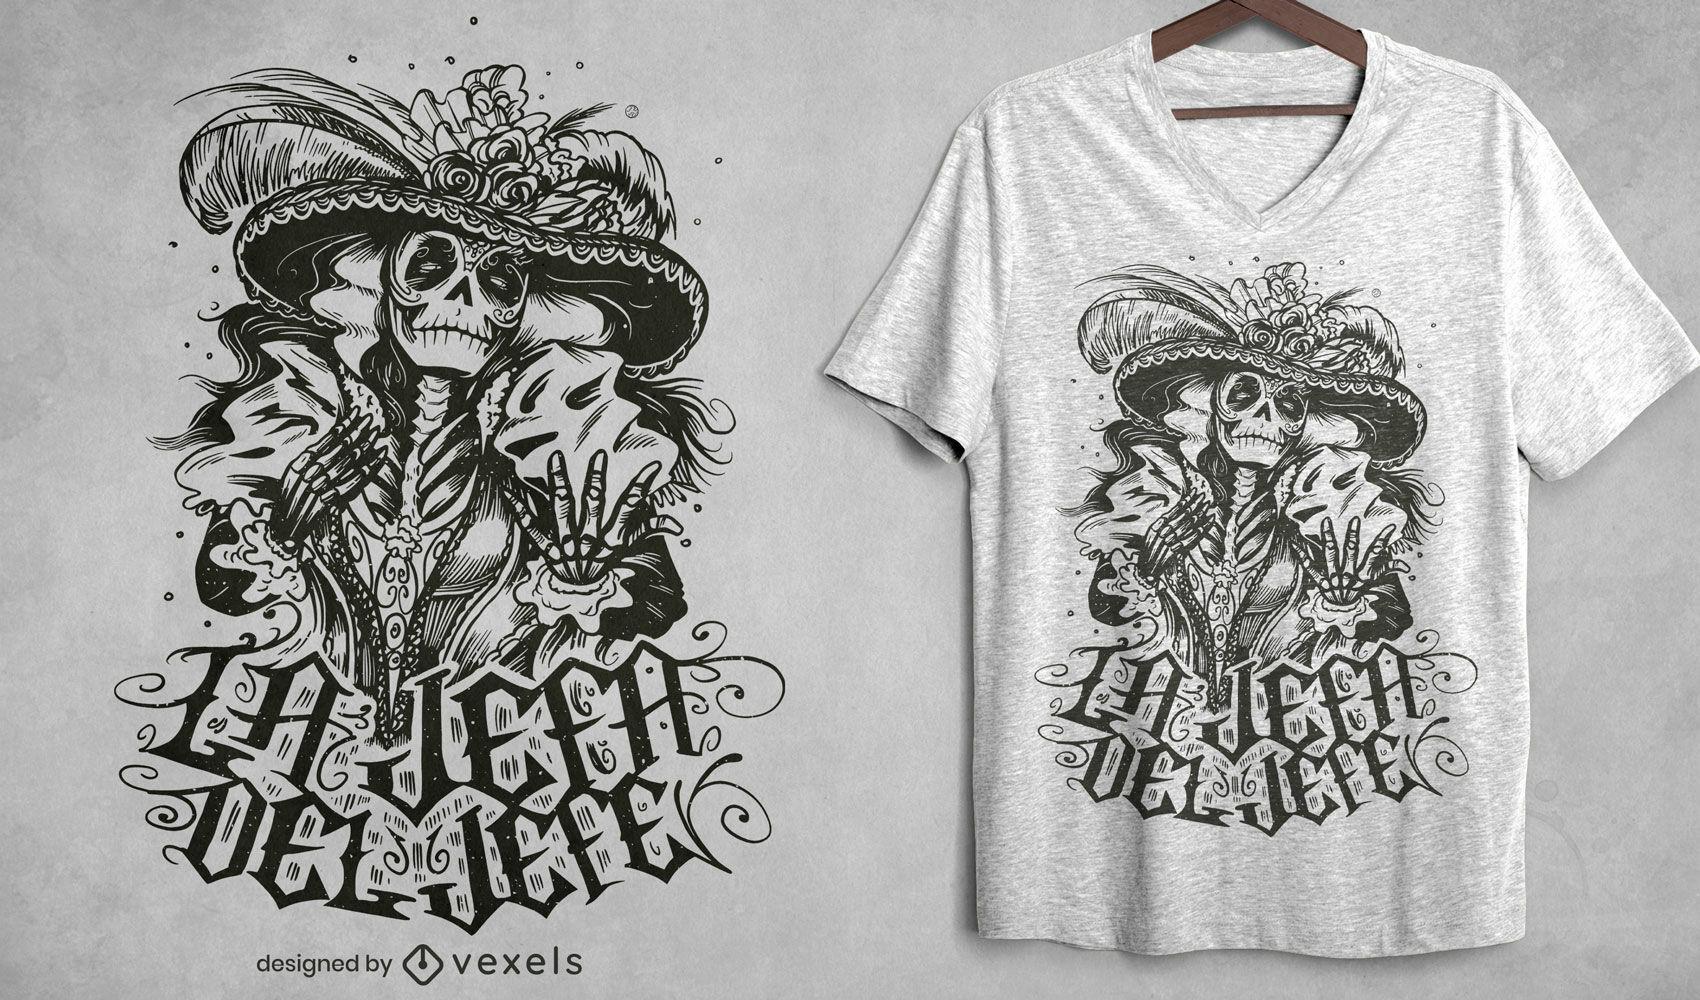 Diseño de camiseta esqueleto personaje mexicano dibujado a mano